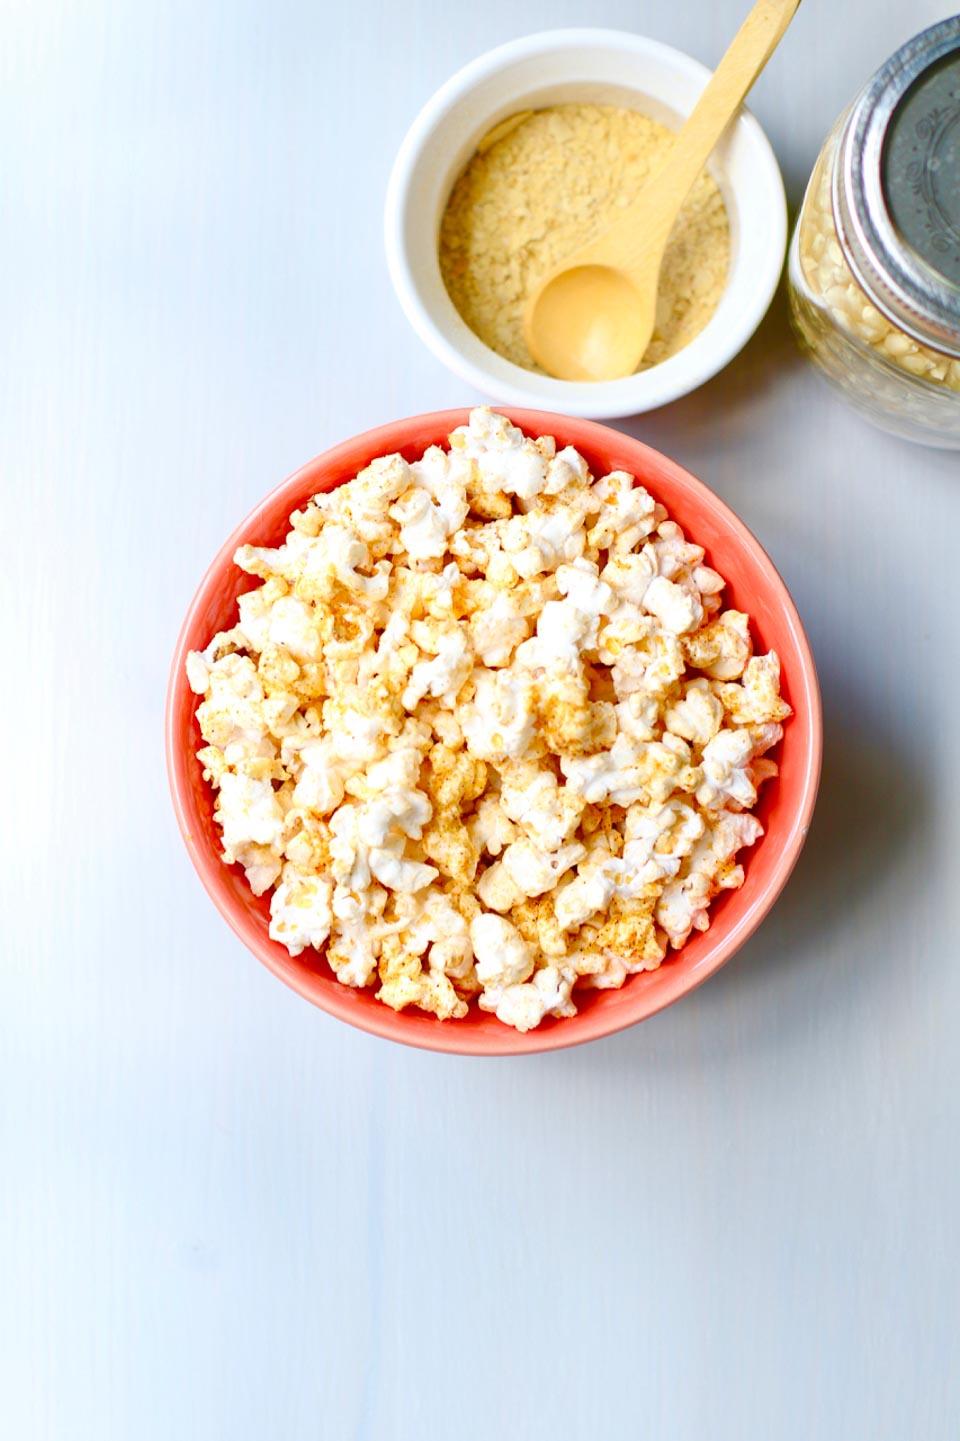 Chili Cheese Popcorn - Nooch Popcorn